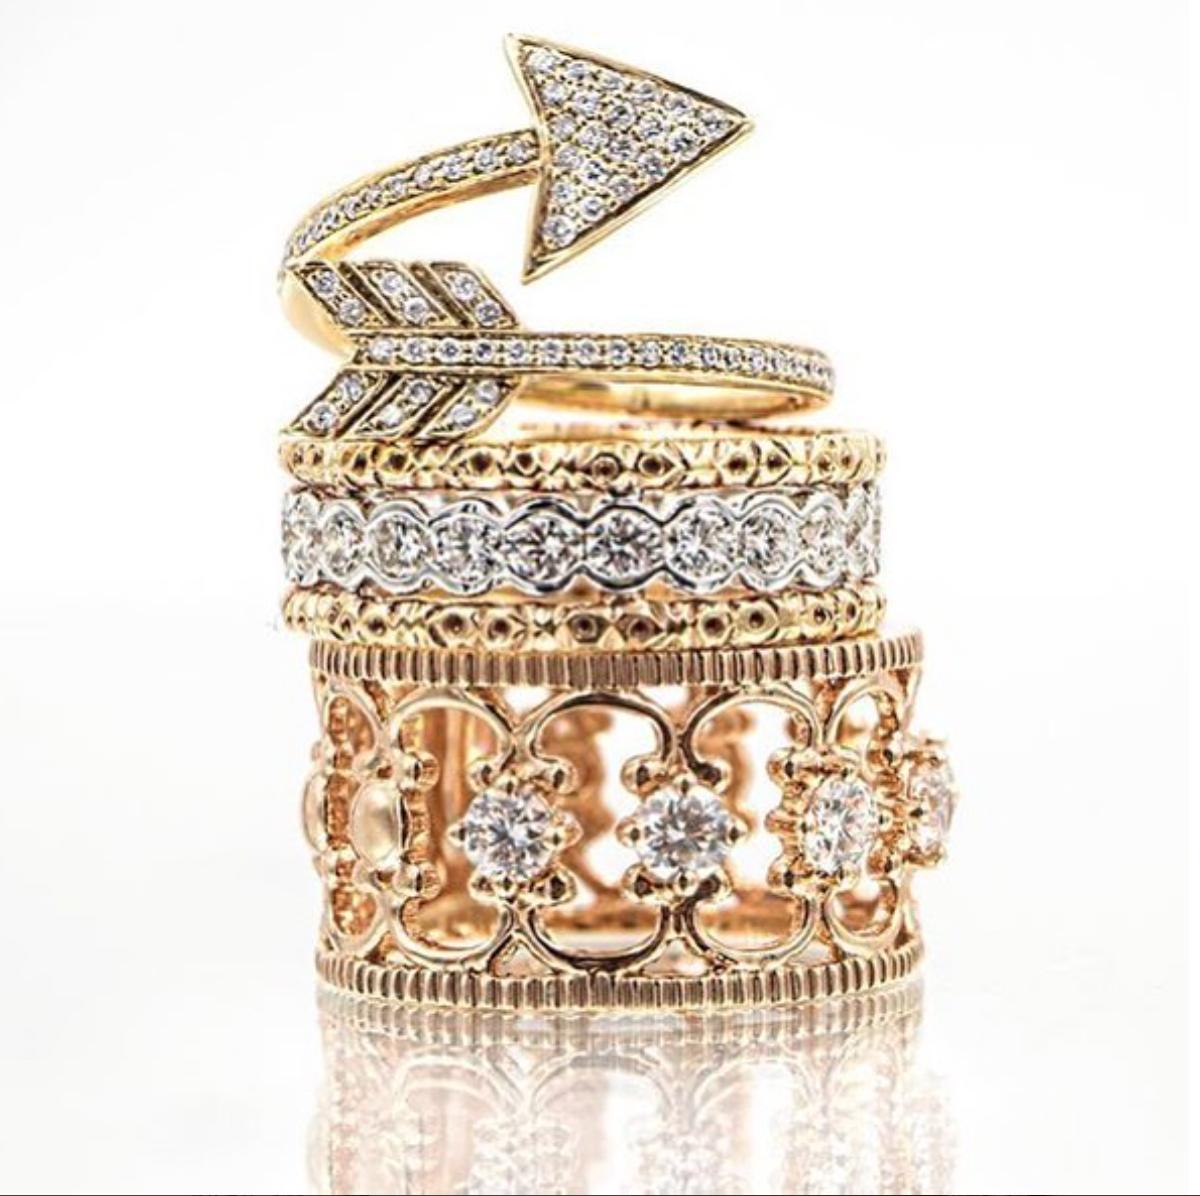 Haniken Jewelers NYC